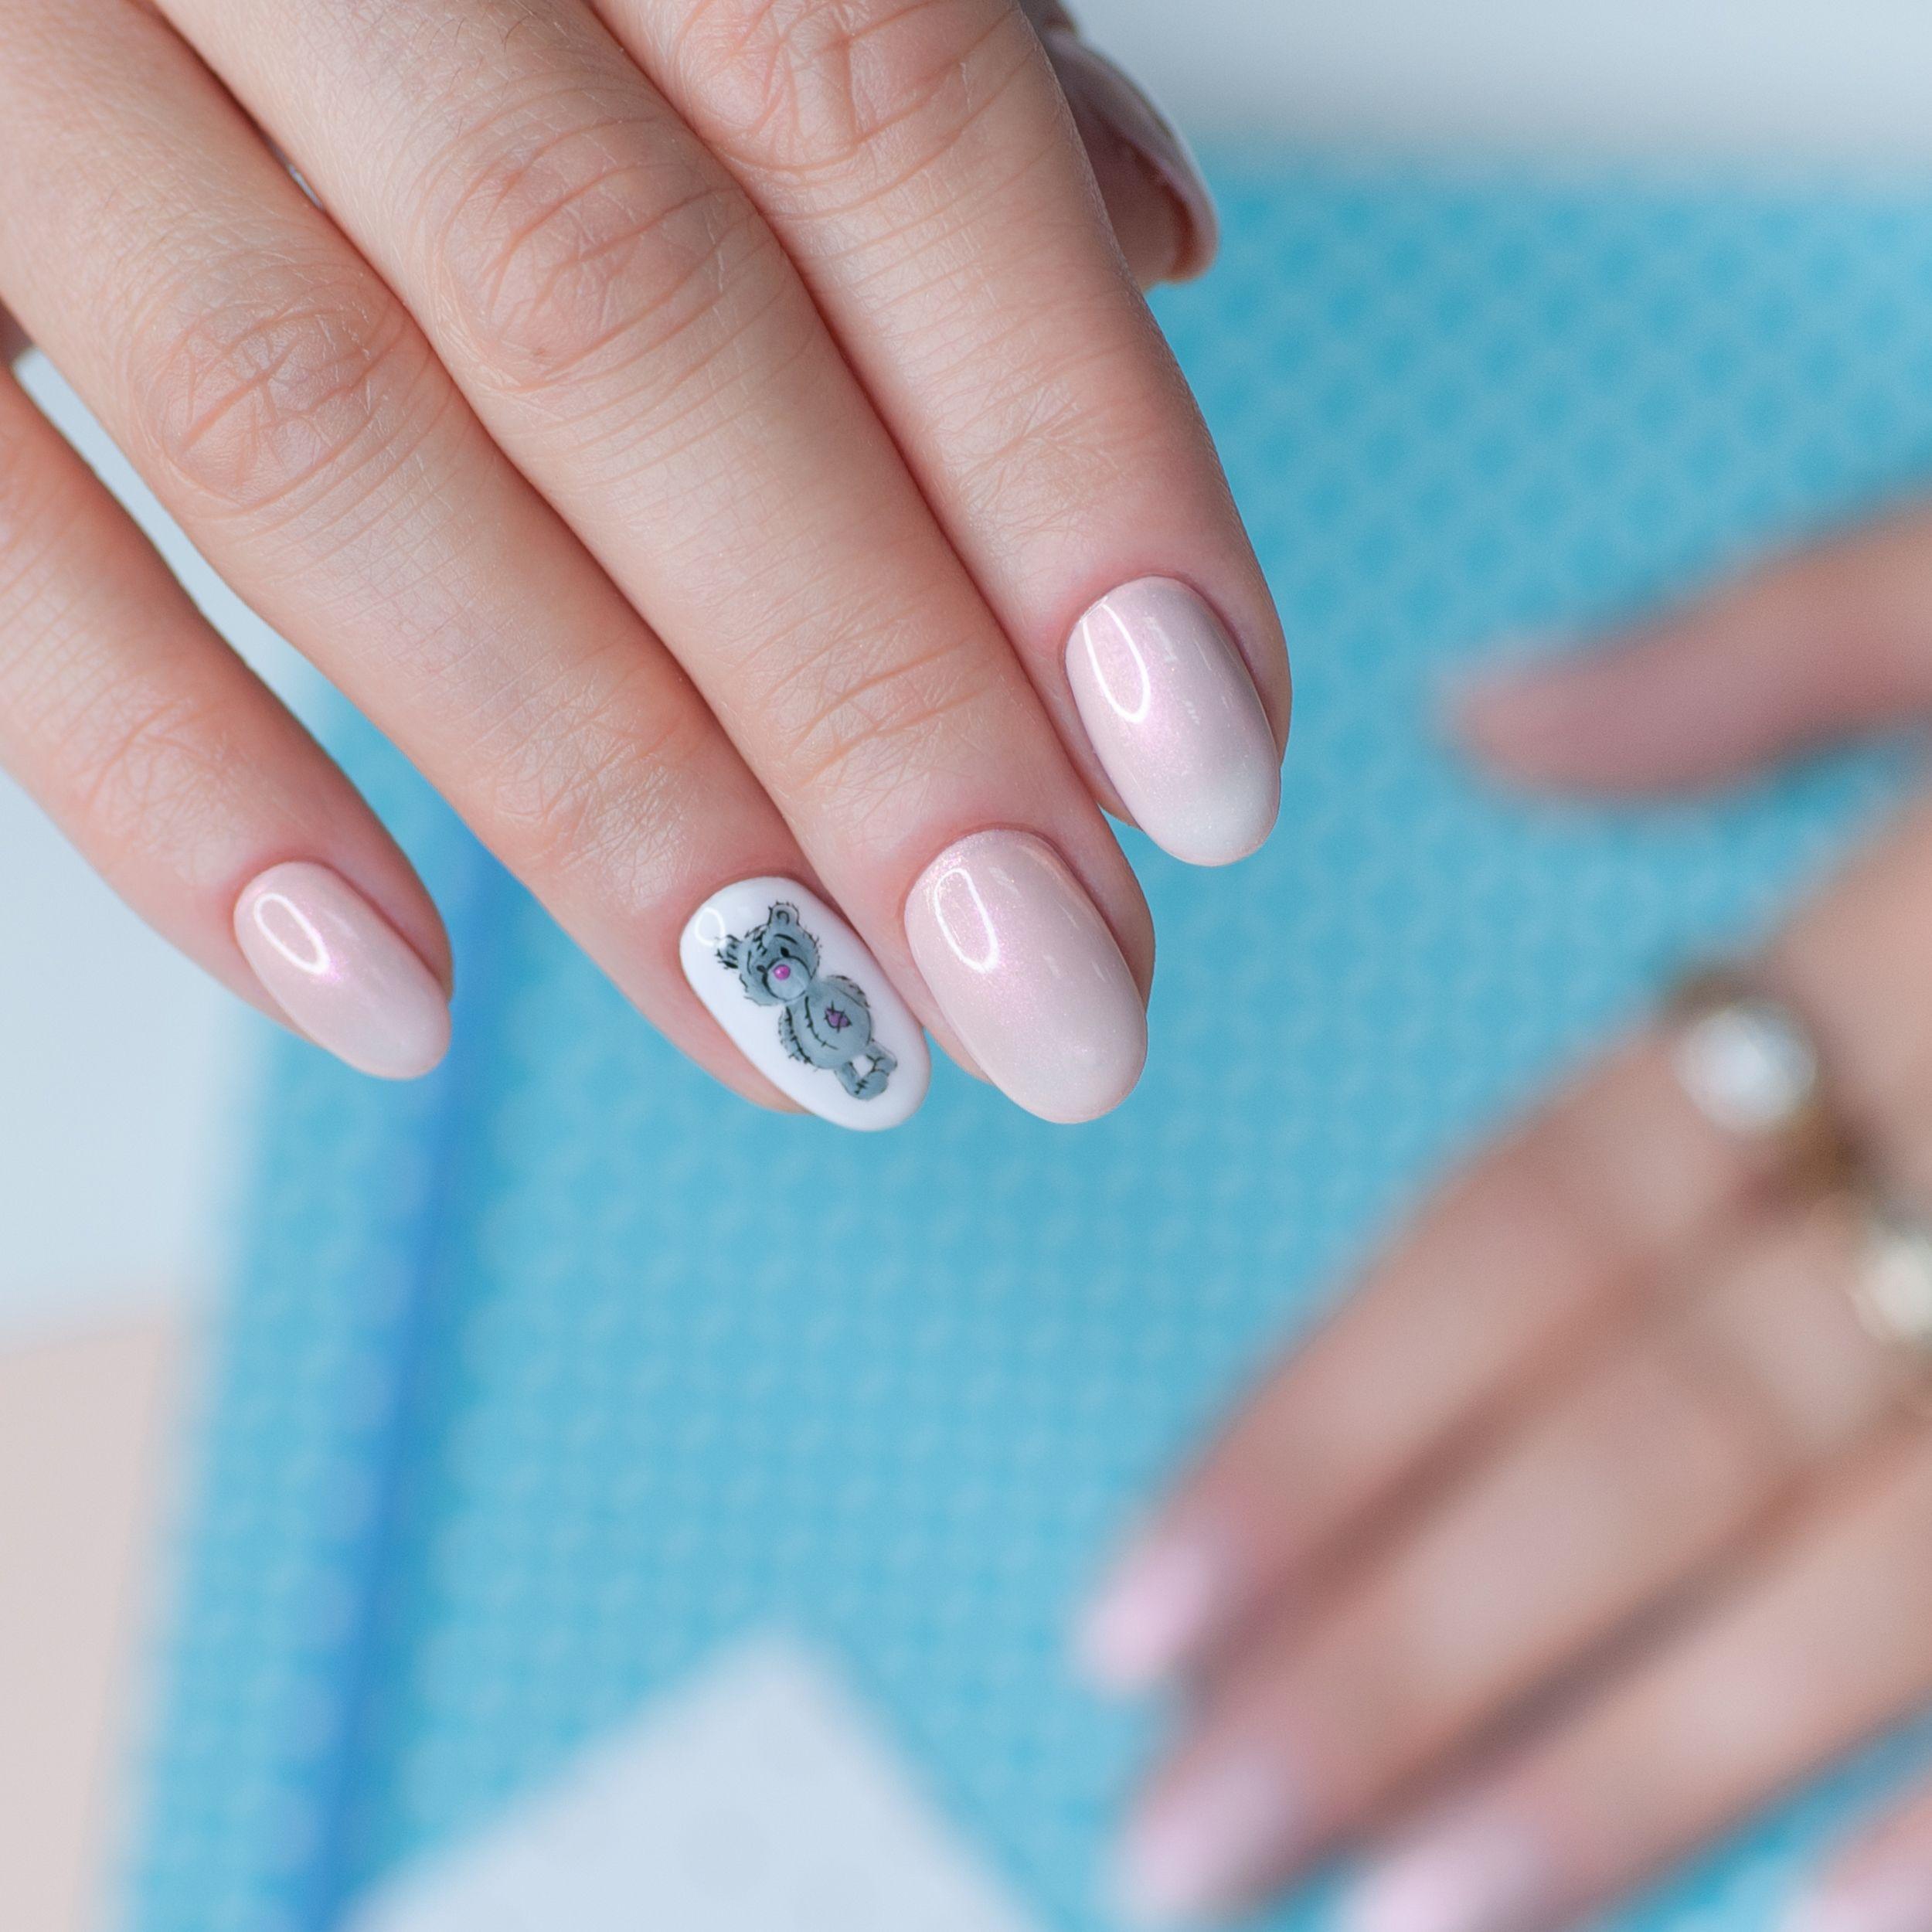 art nails manicure CNI Арт маникюр ногти | CNI manicure